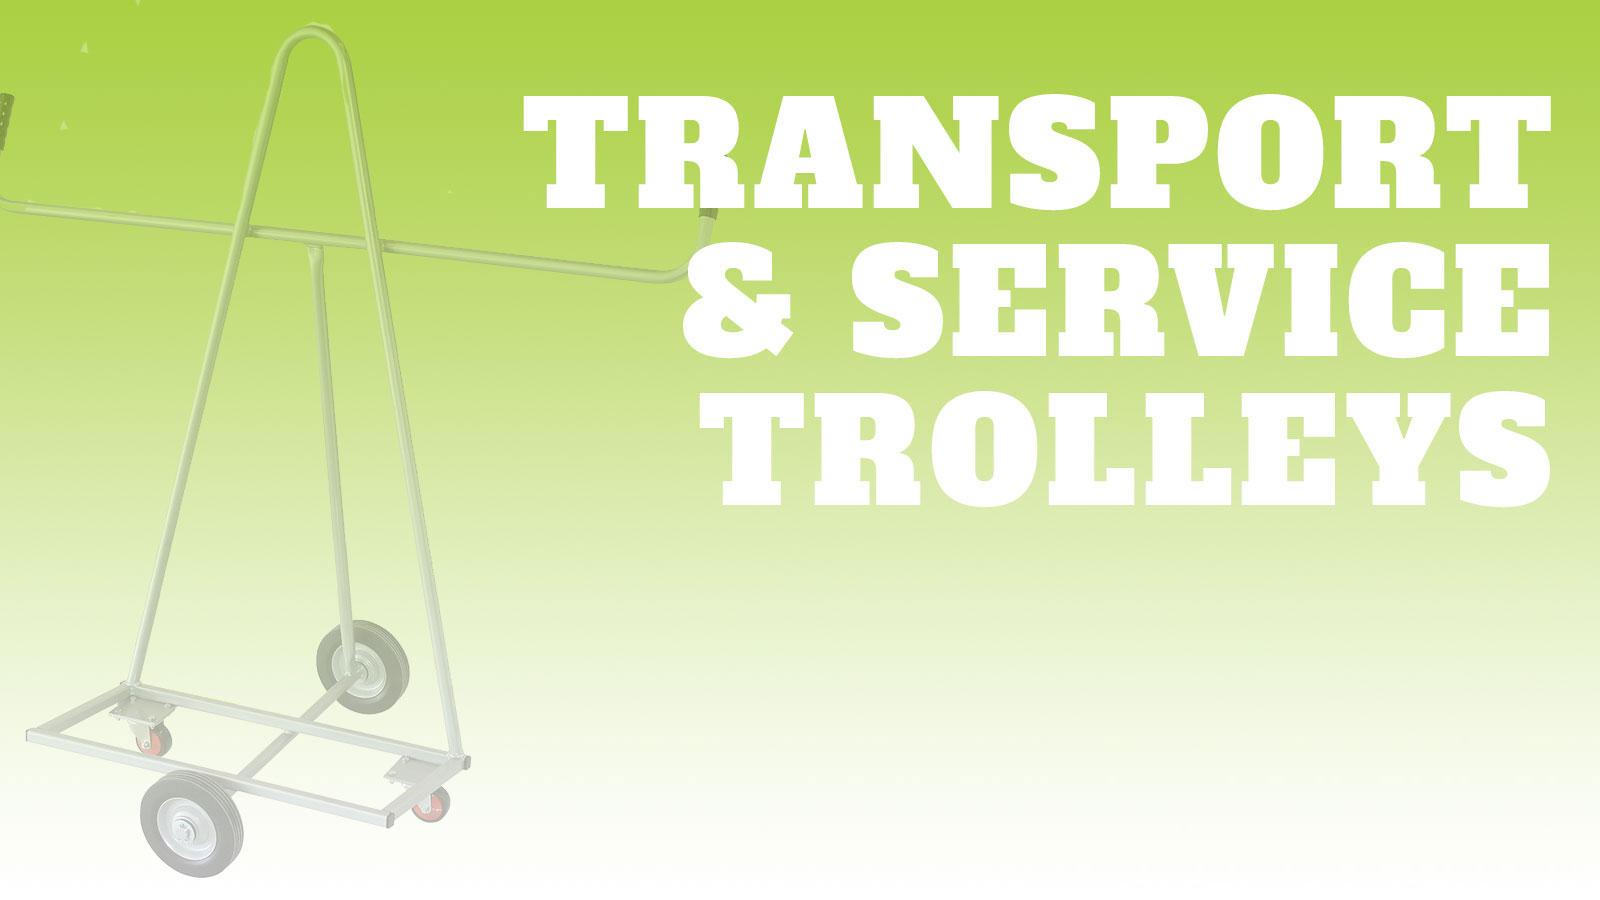 Warehouse-Transport-&-Service-2